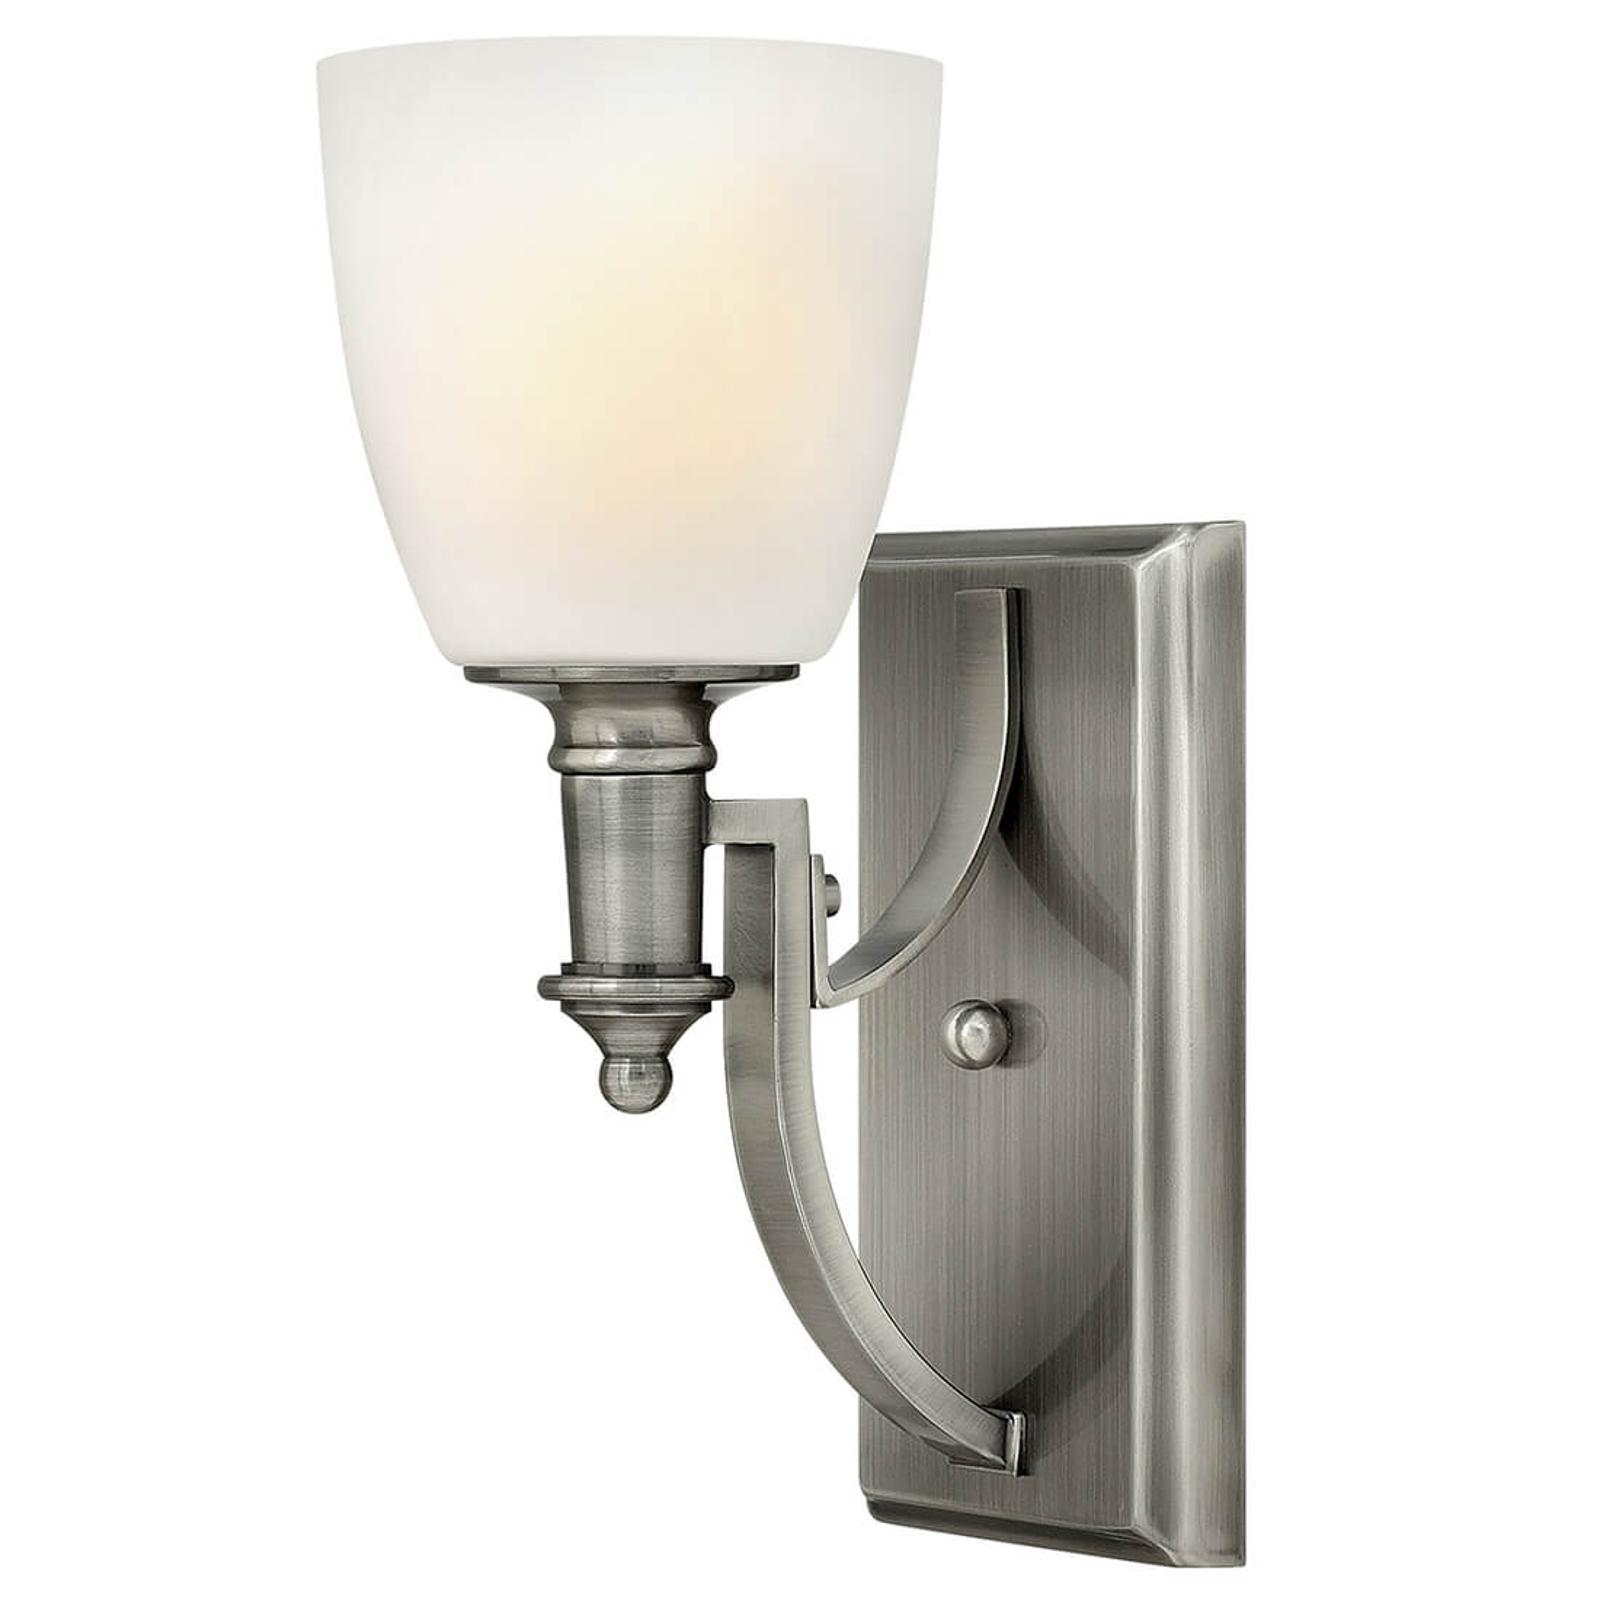 Antik vernickelte Wandlampe Truman